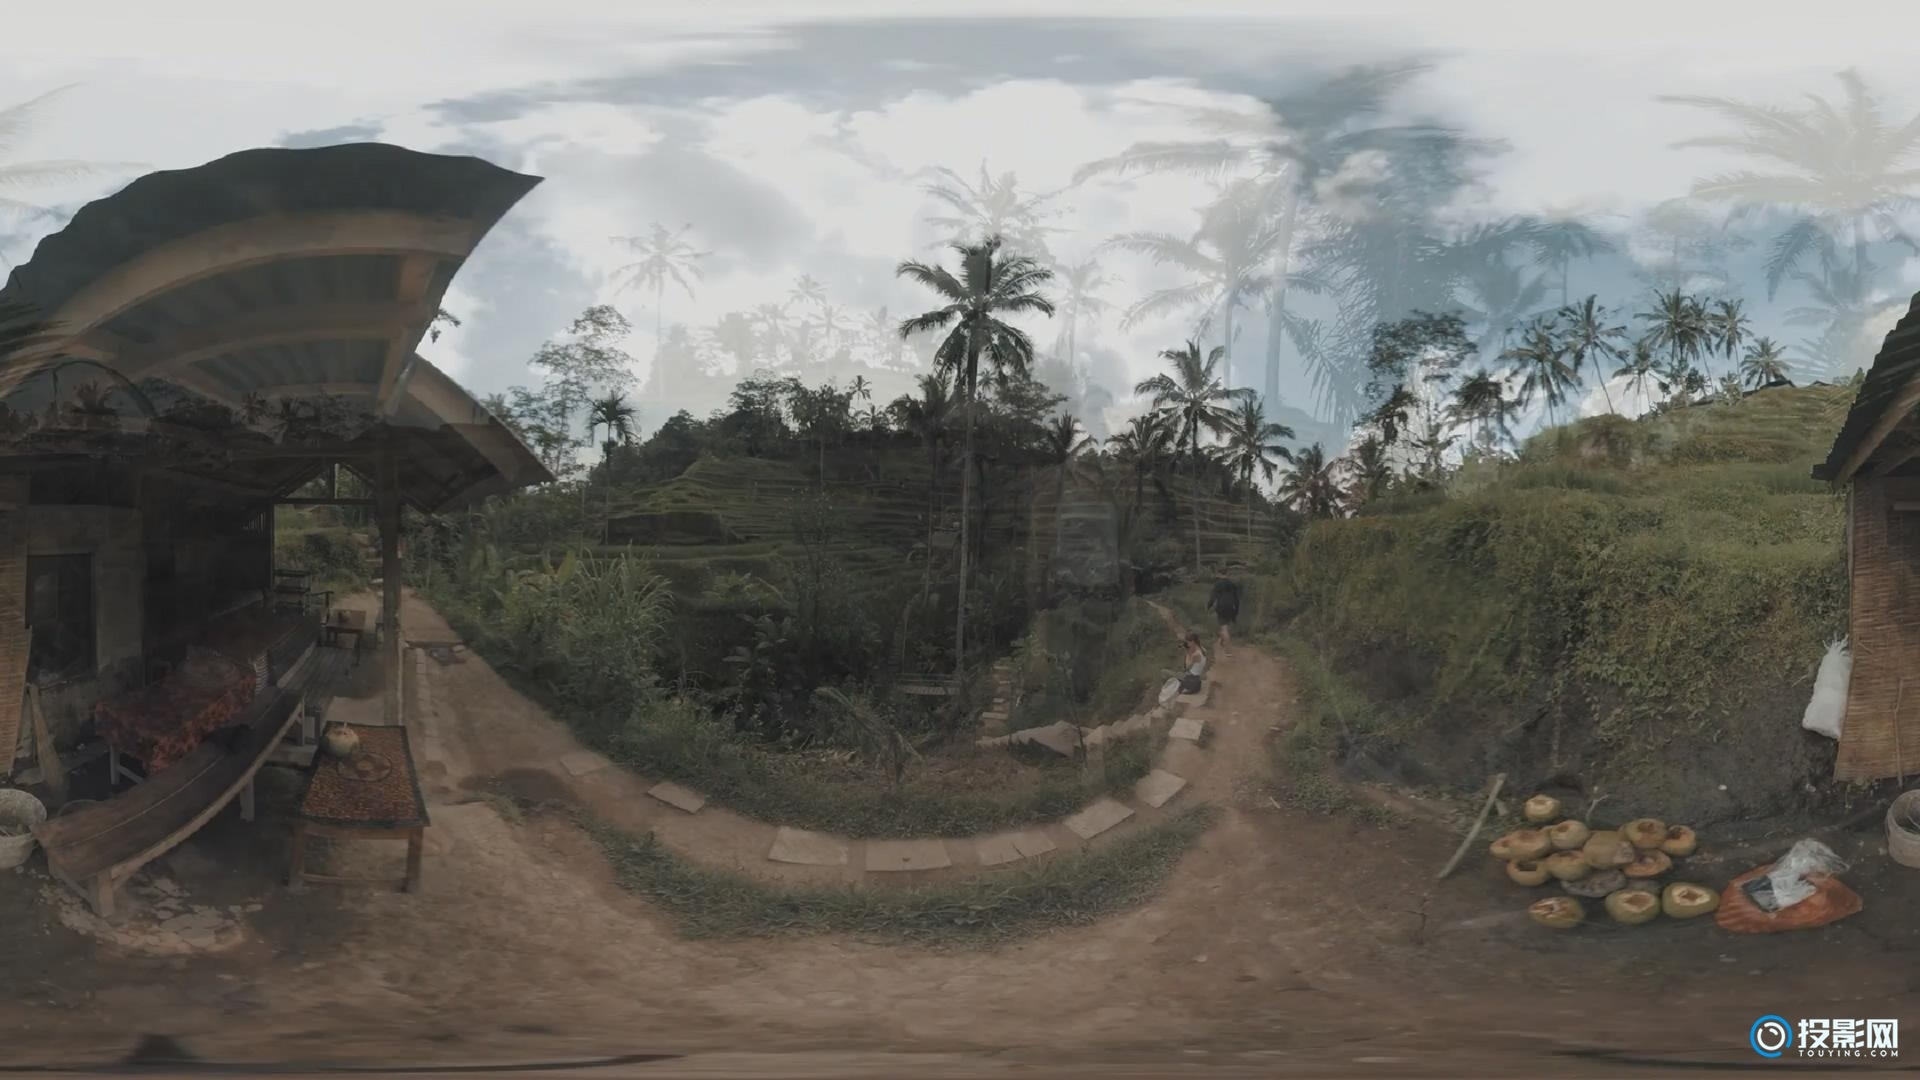 [VR360°全景] 环游巴厘岛 VR视频下载